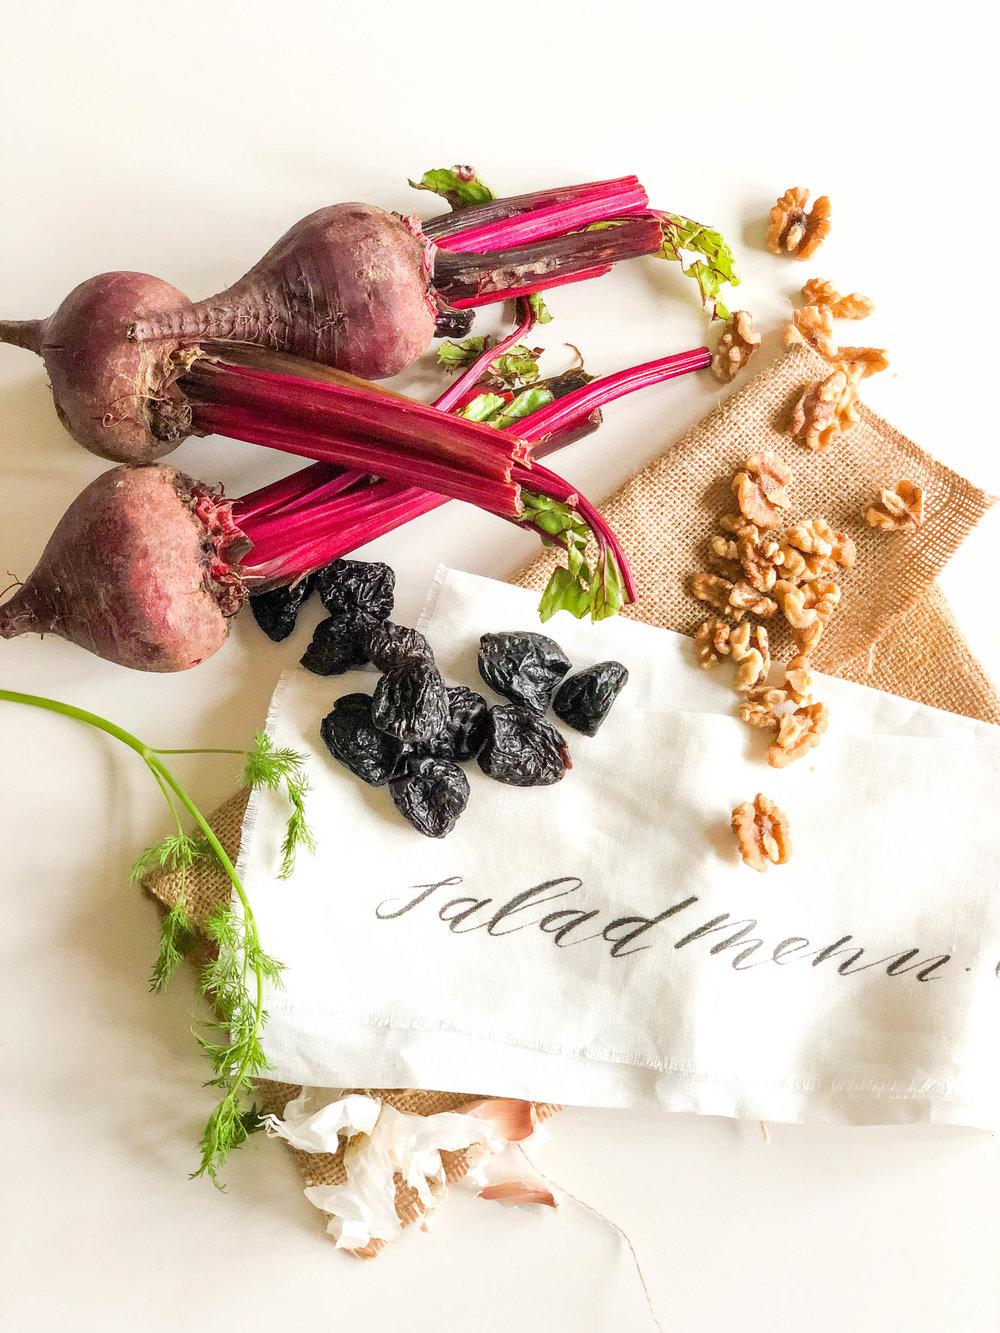 Beet prune salad with walnuts